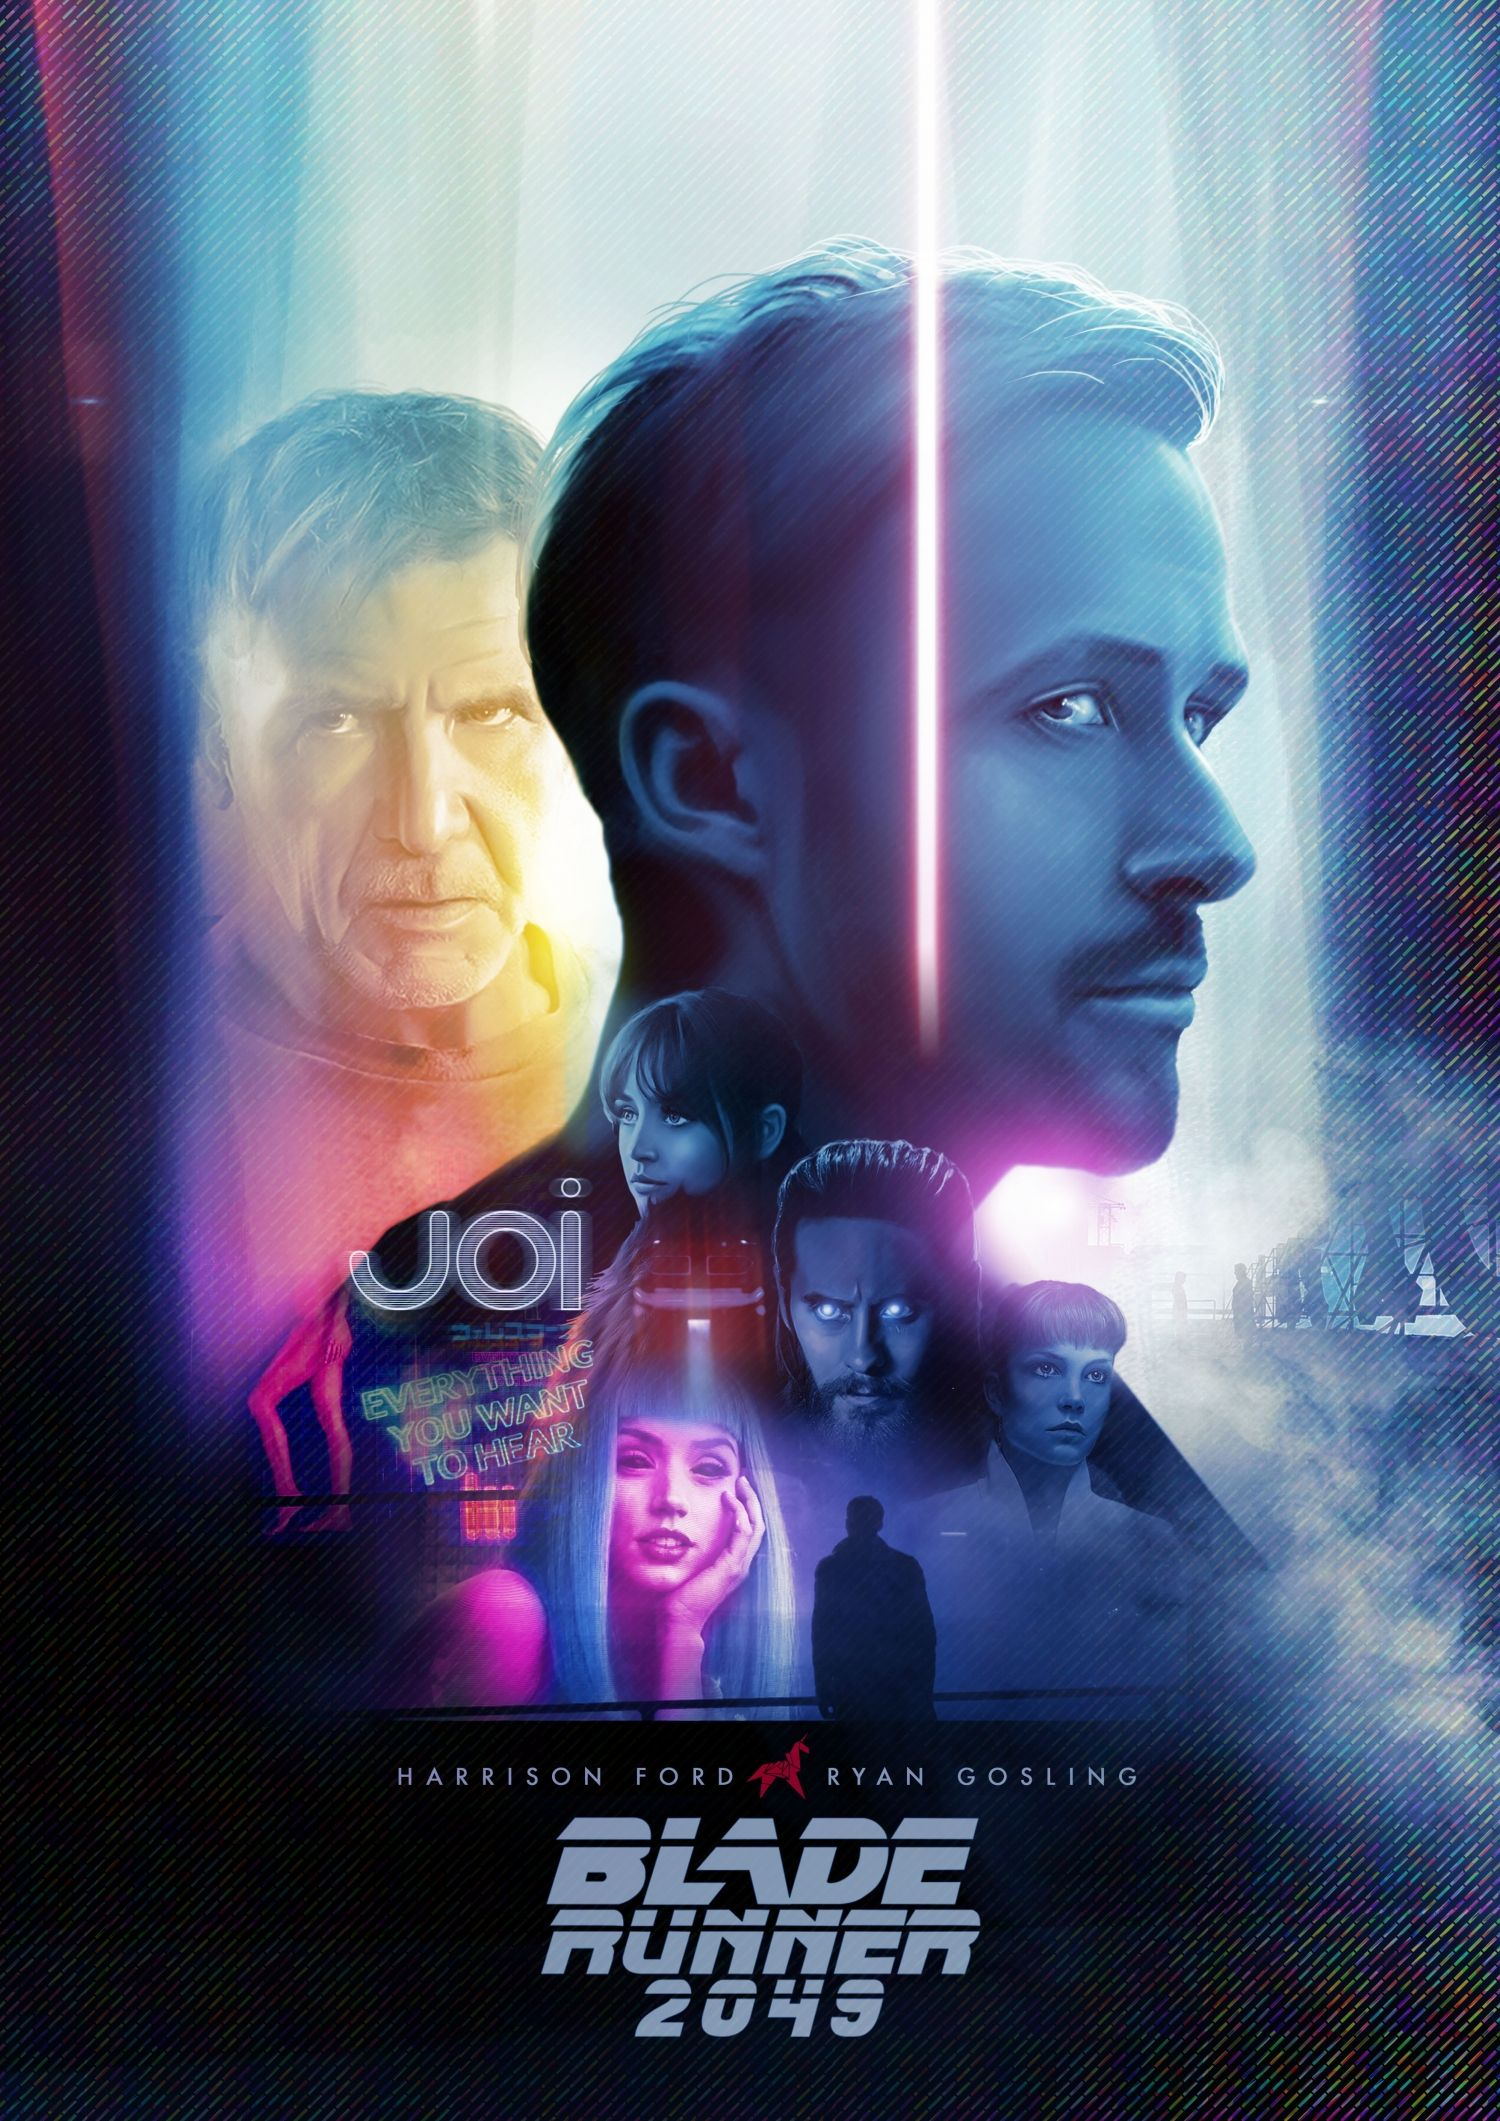 Blade Runner 2049 Poster Movie Posters Plakaty Filmowe I